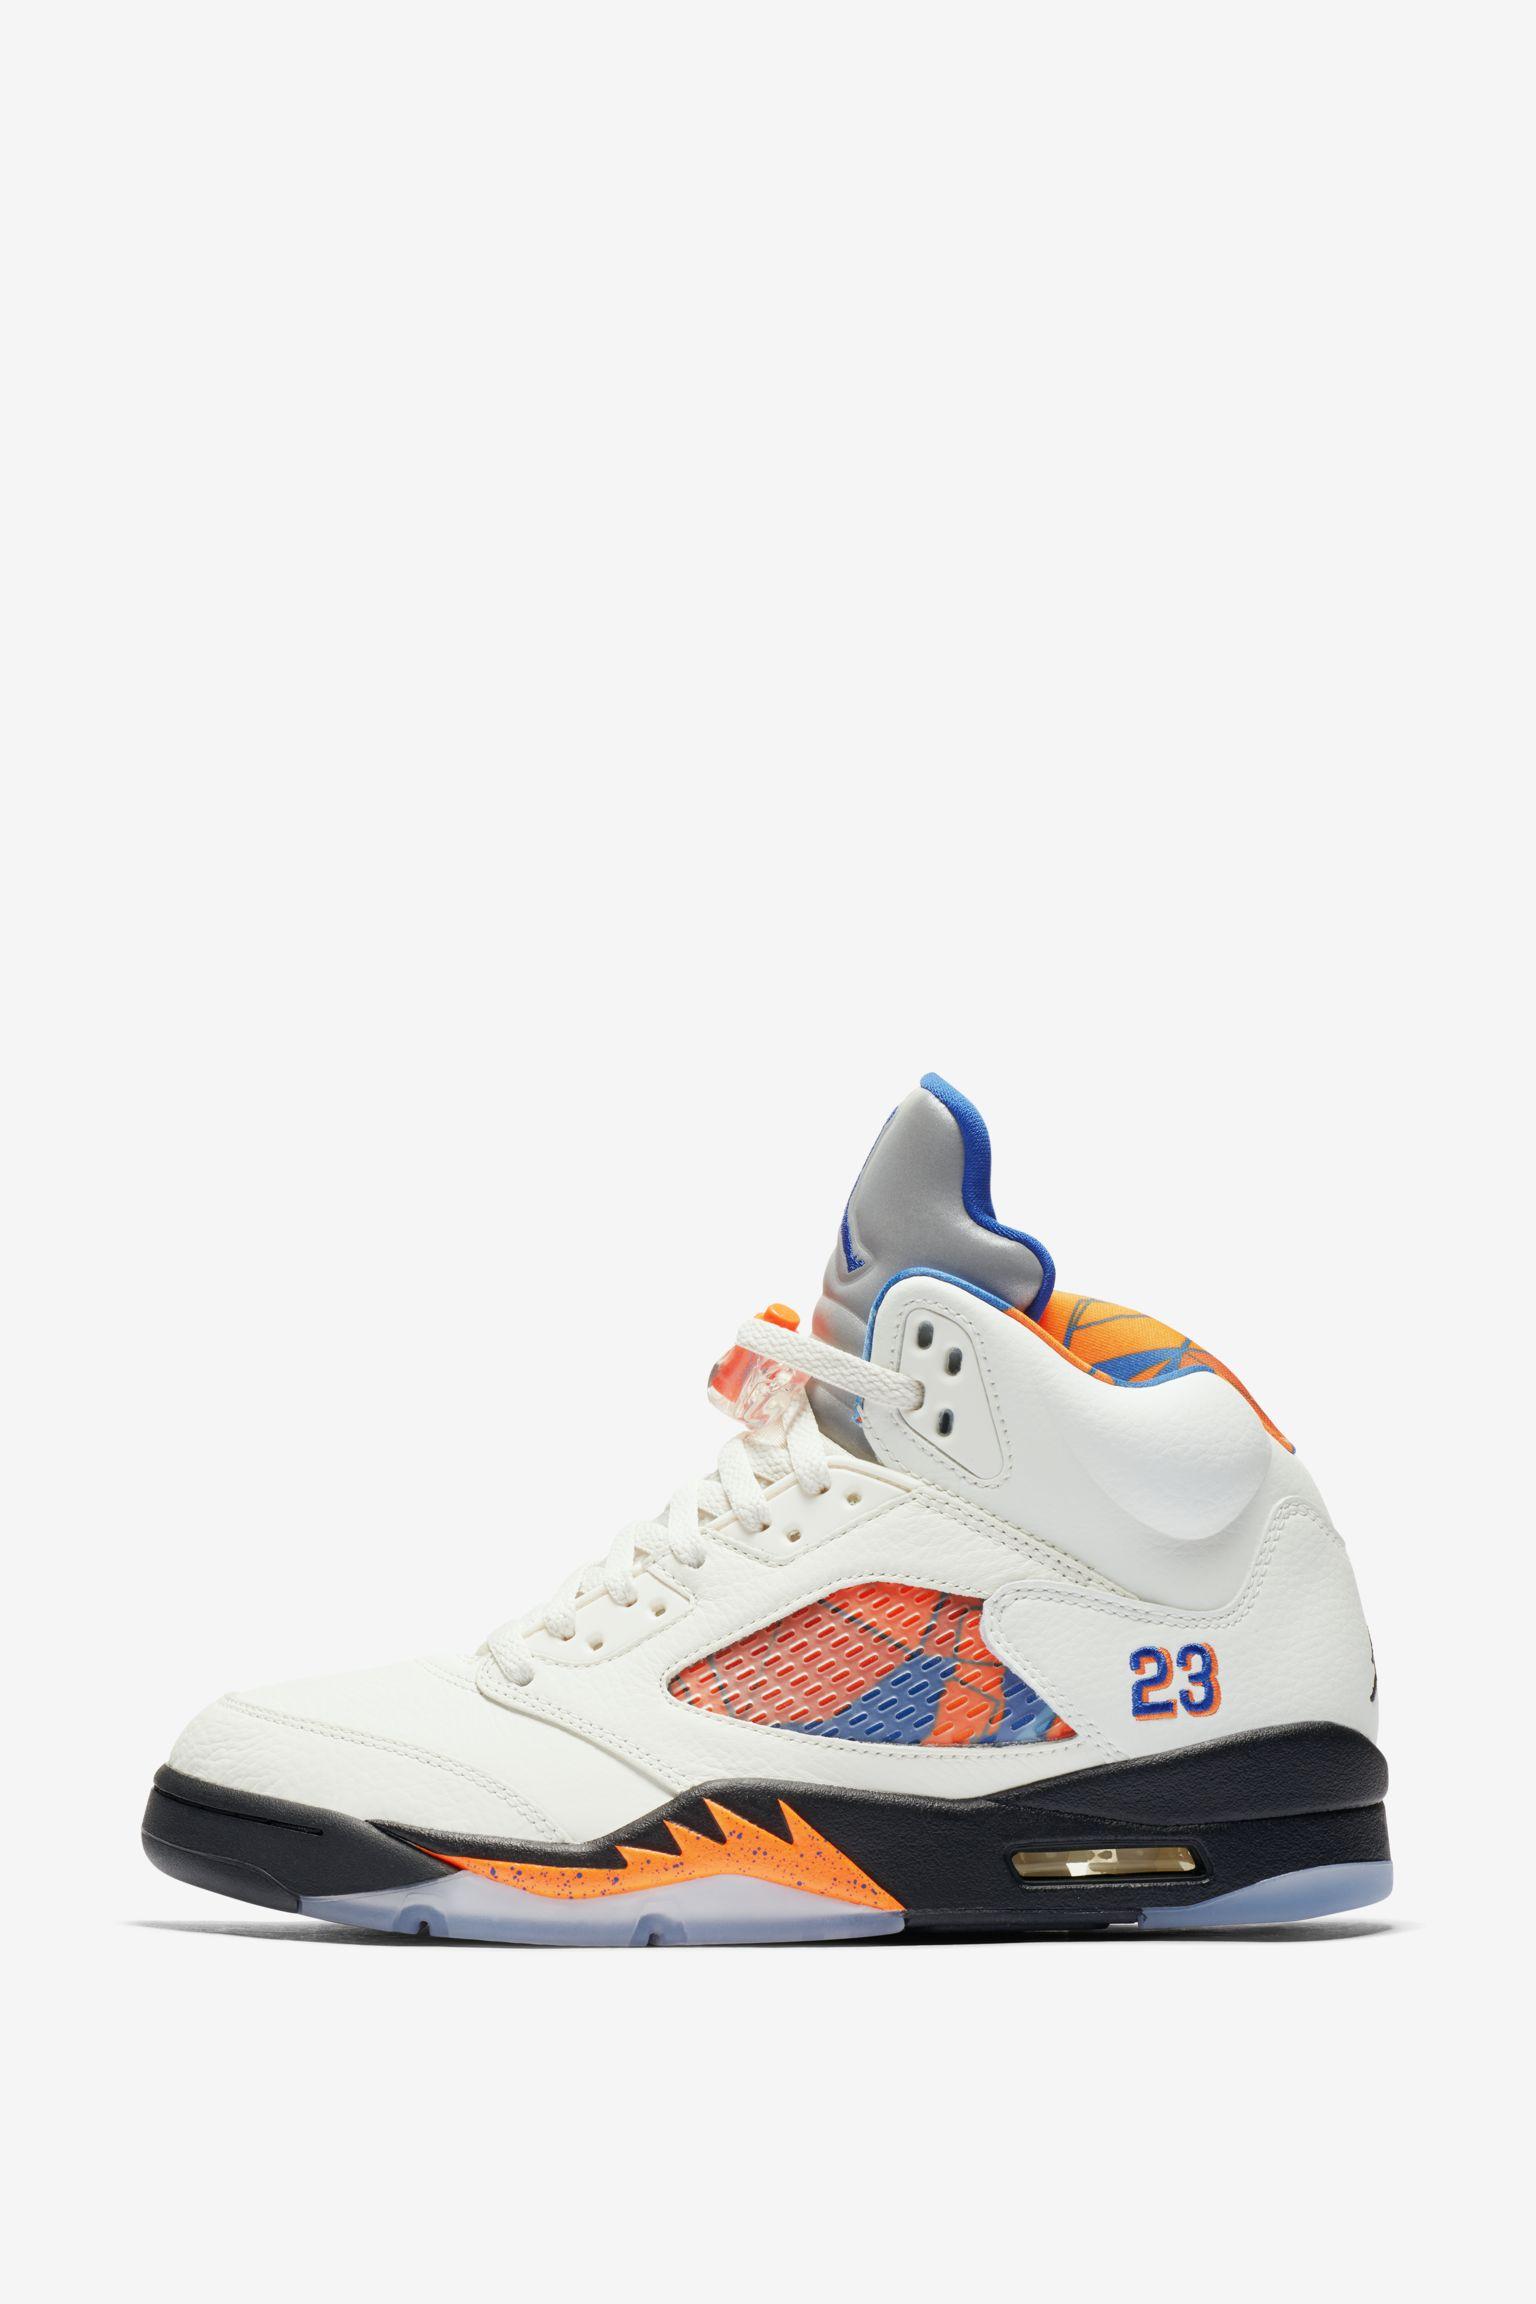 Air Jordan 5 Retro 'Sail & Racer Blue' Release Date. Nike SNKRS